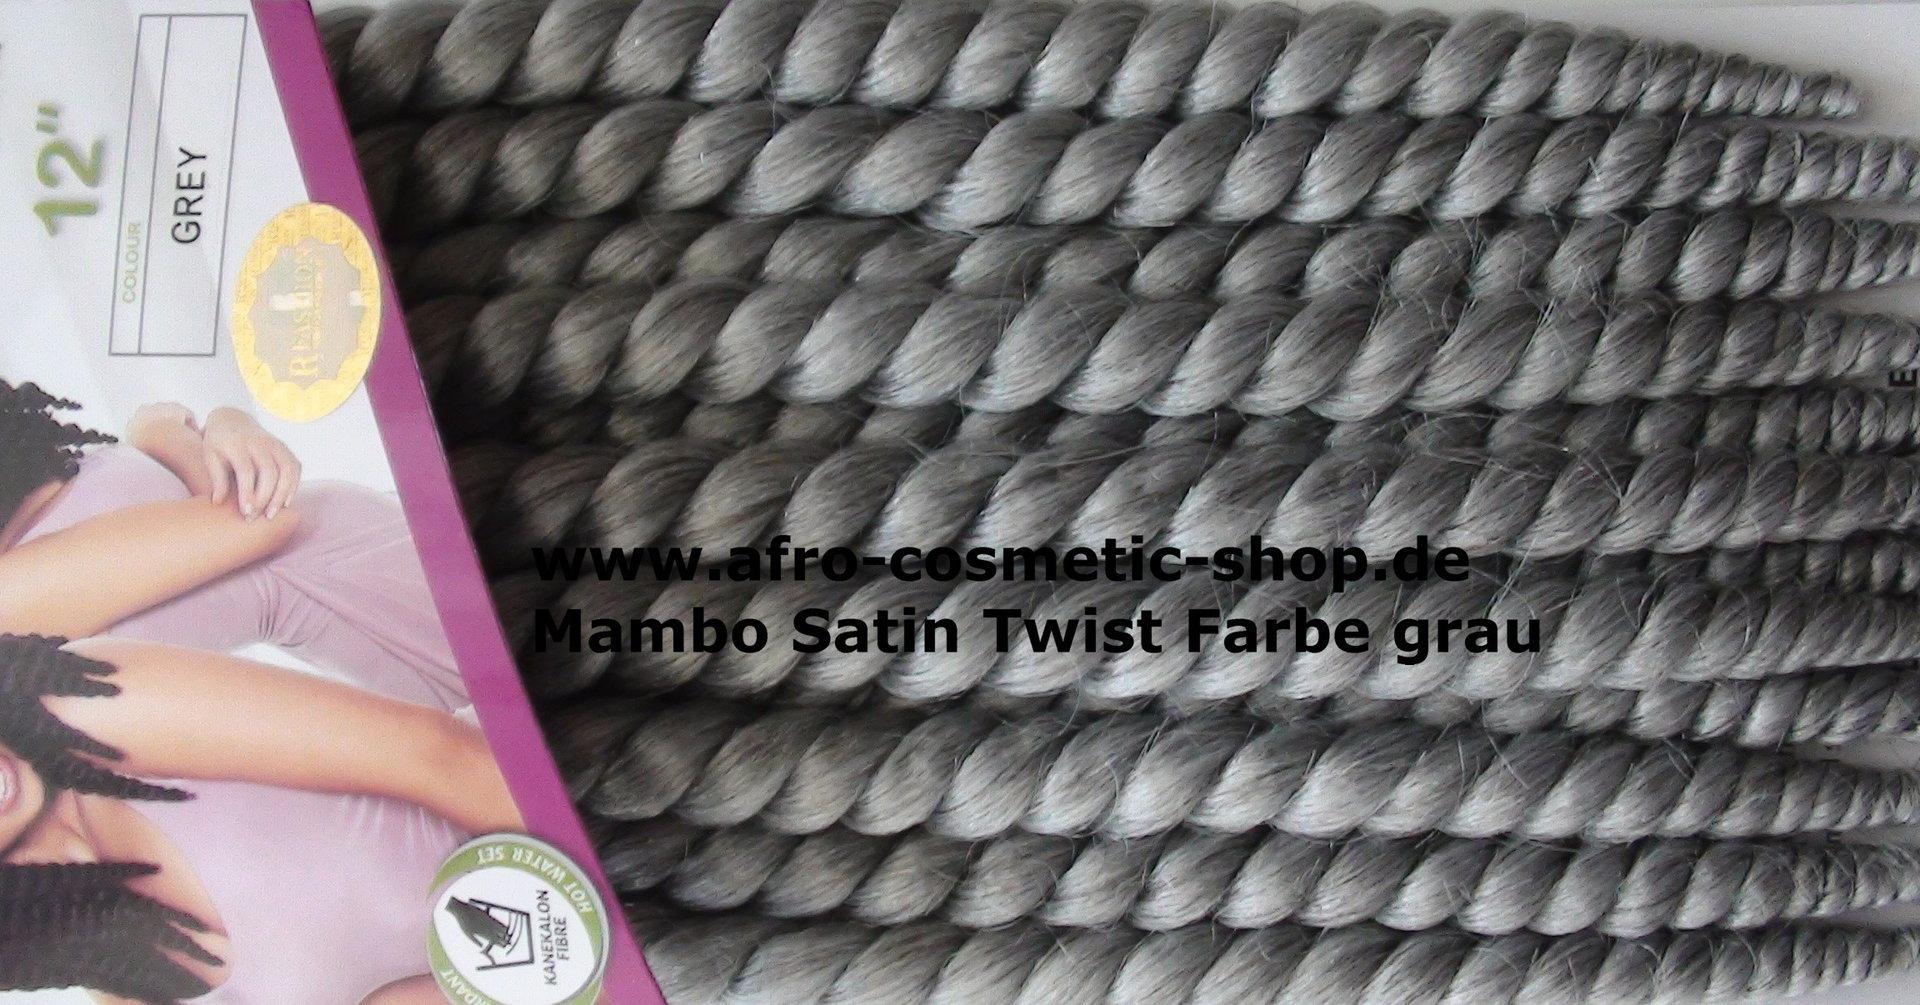 mambo satin twist 12 farbe grau afro cosmetic shop. Black Bedroom Furniture Sets. Home Design Ideas